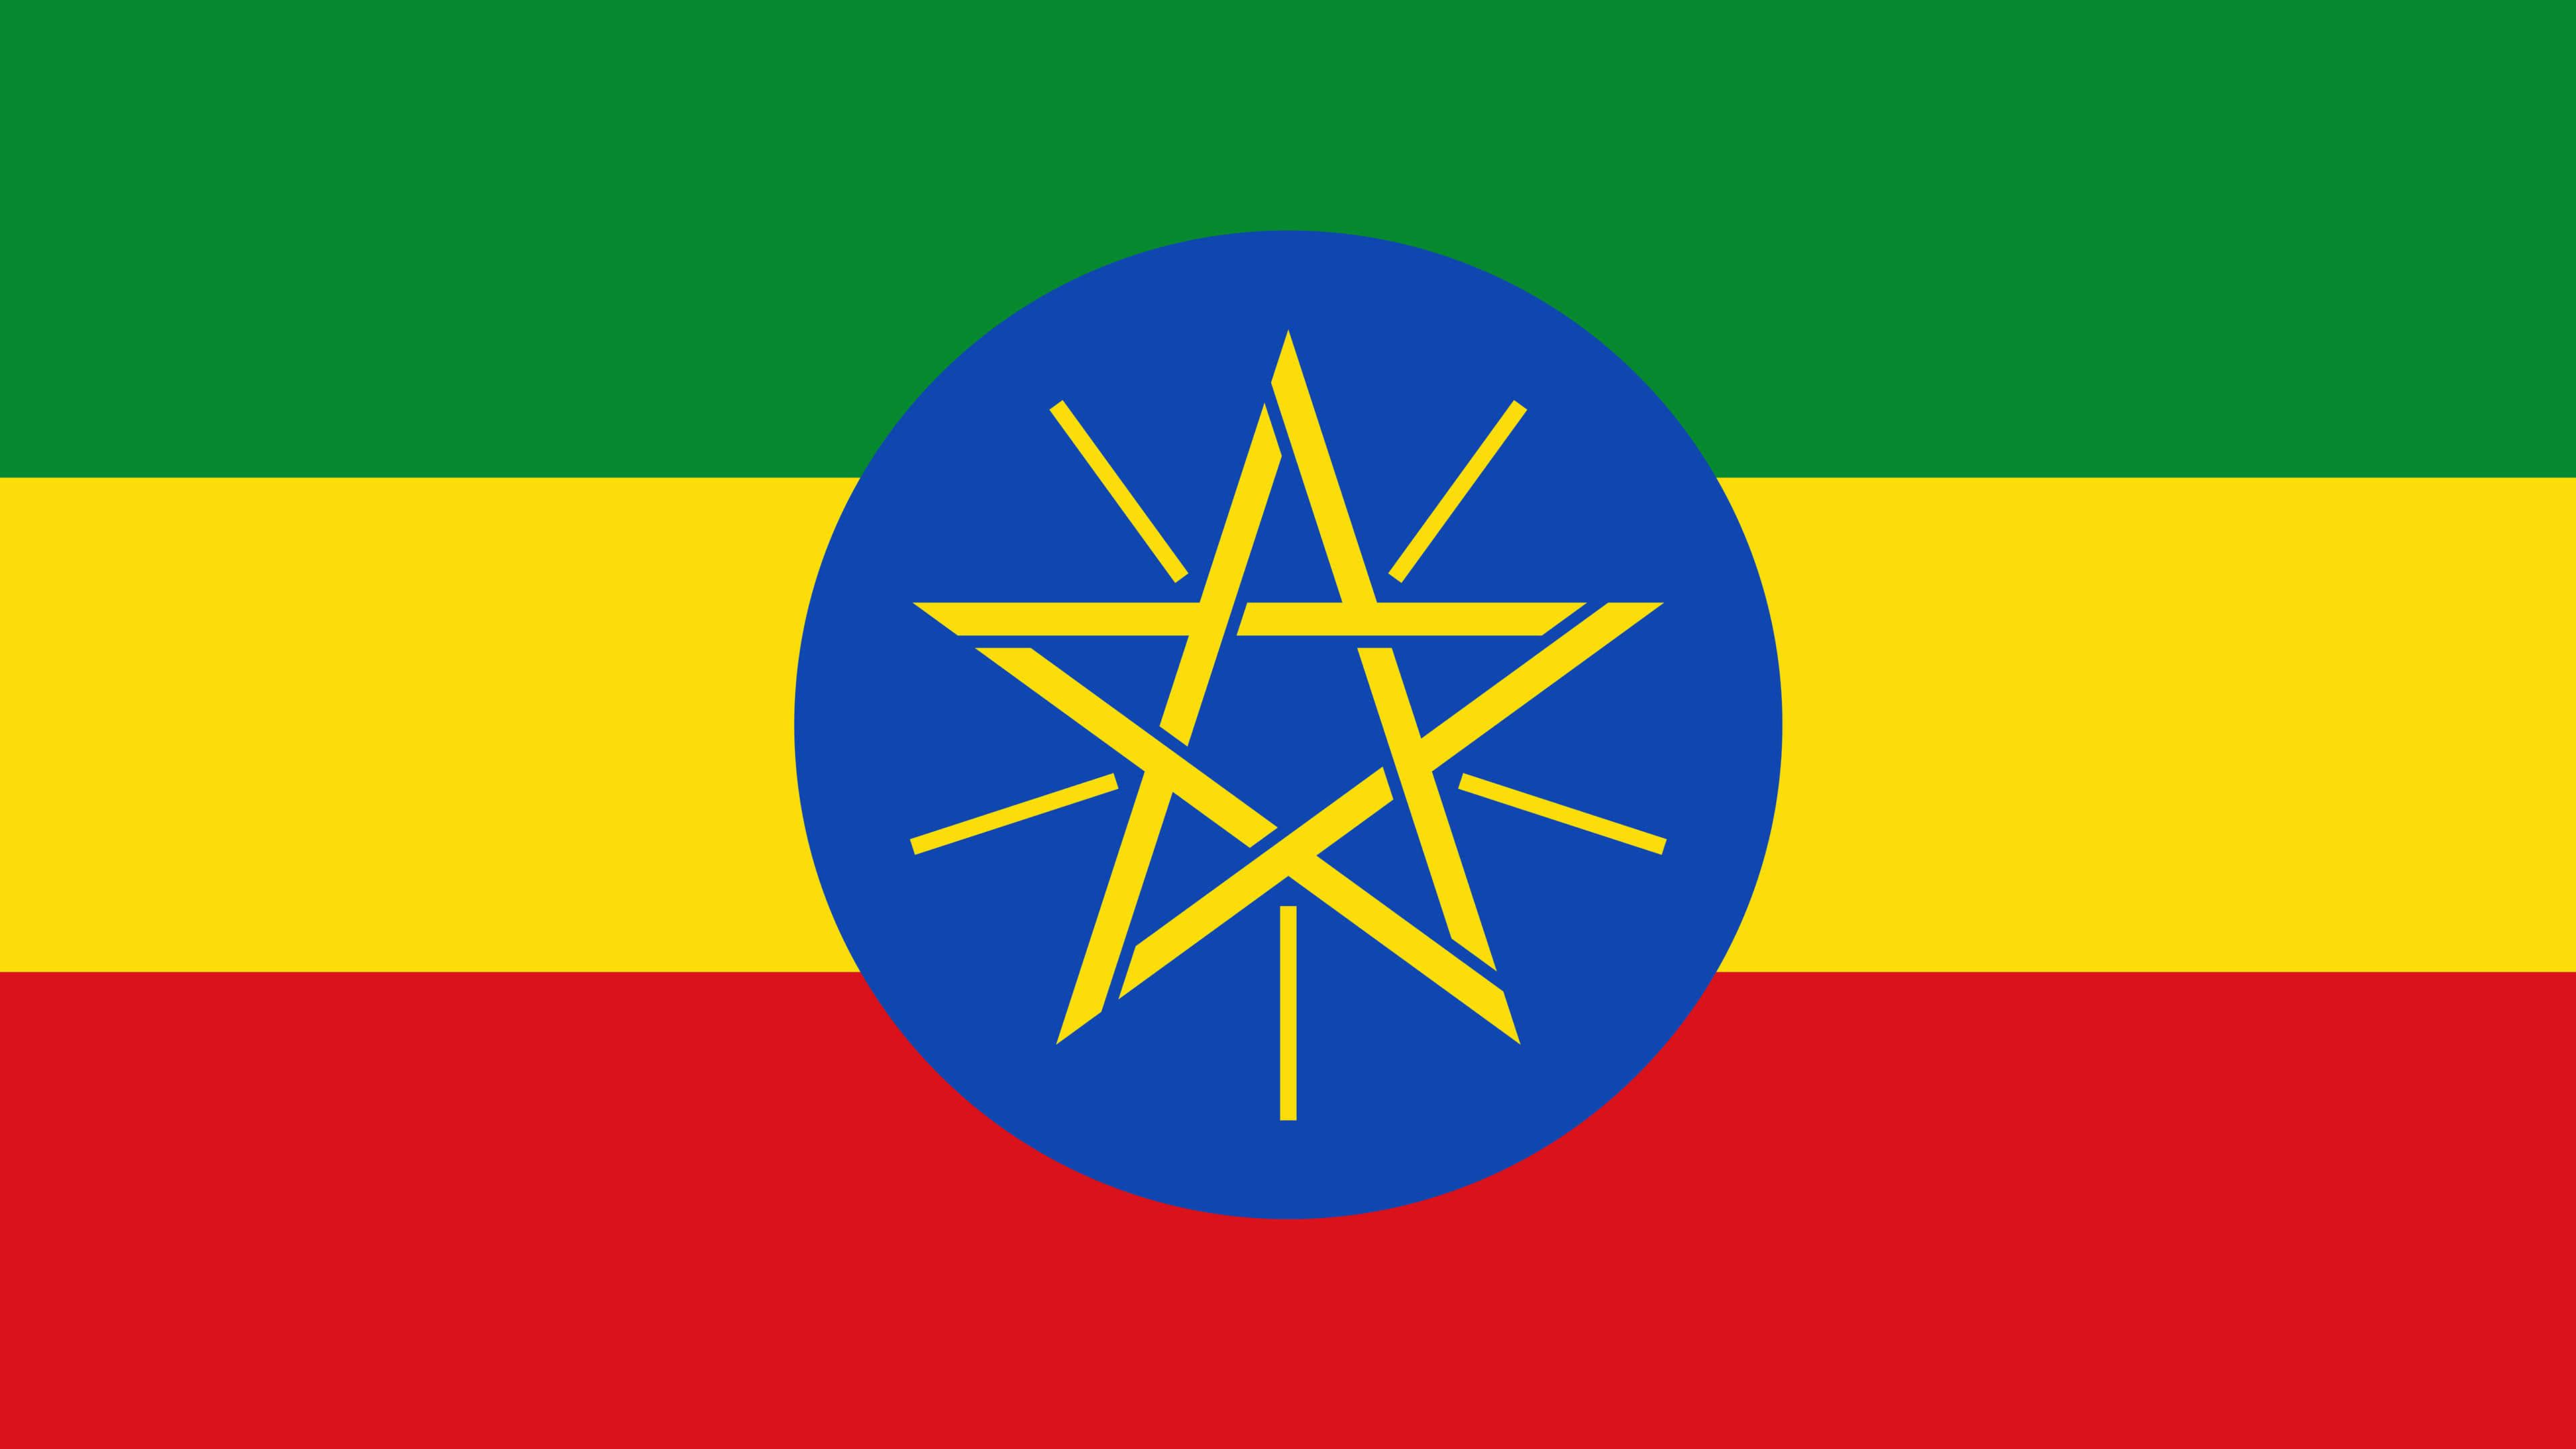 ethiopia flag uhd 4k wallpaper